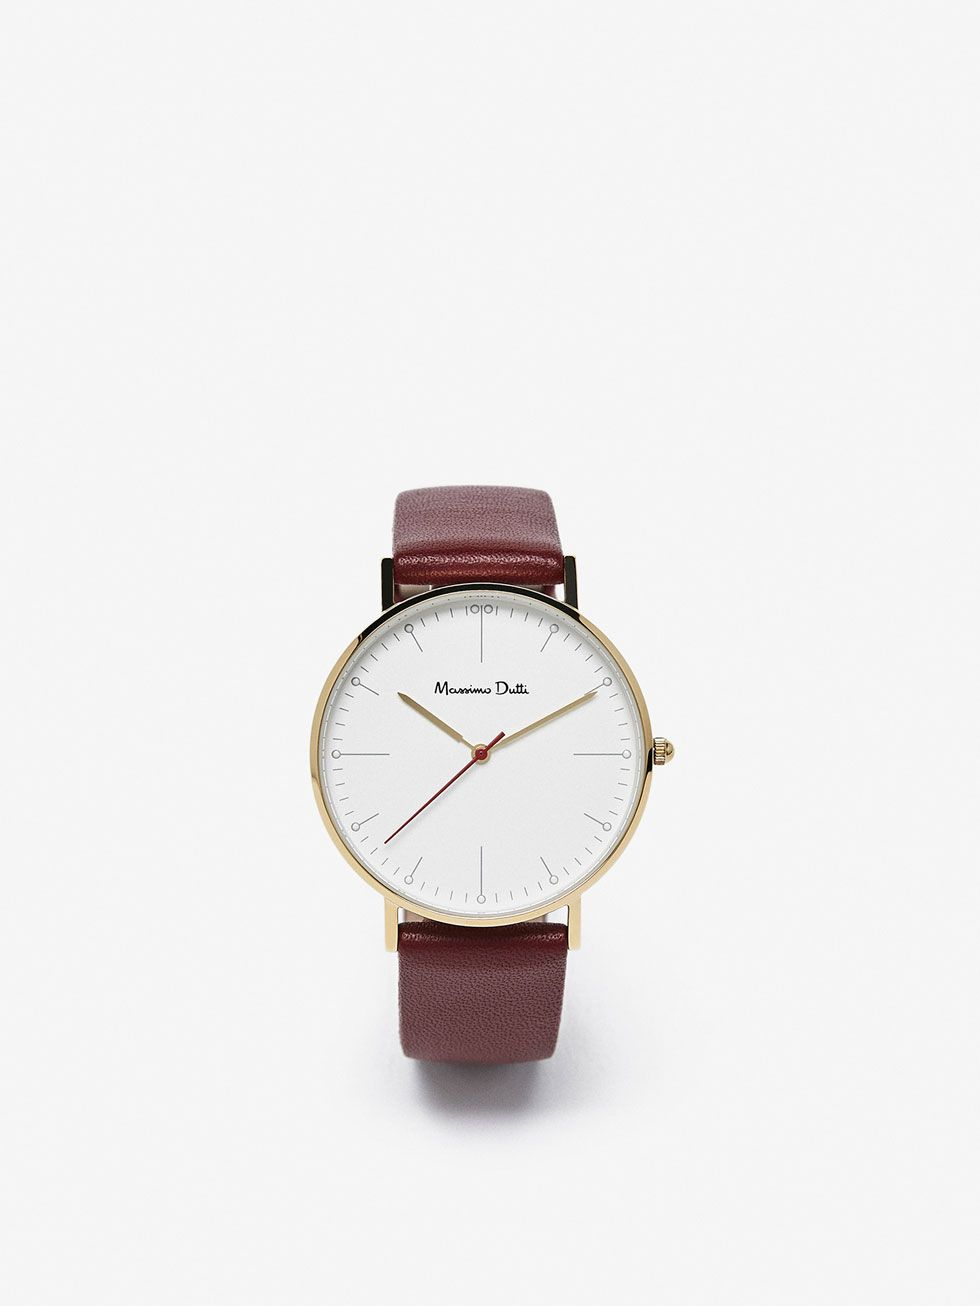 a63a5619e RELOJ DETALLE AGUJA COLOR de MUJER - Accesorios - Relojes de Massimo Dutti  de Primavera Verano